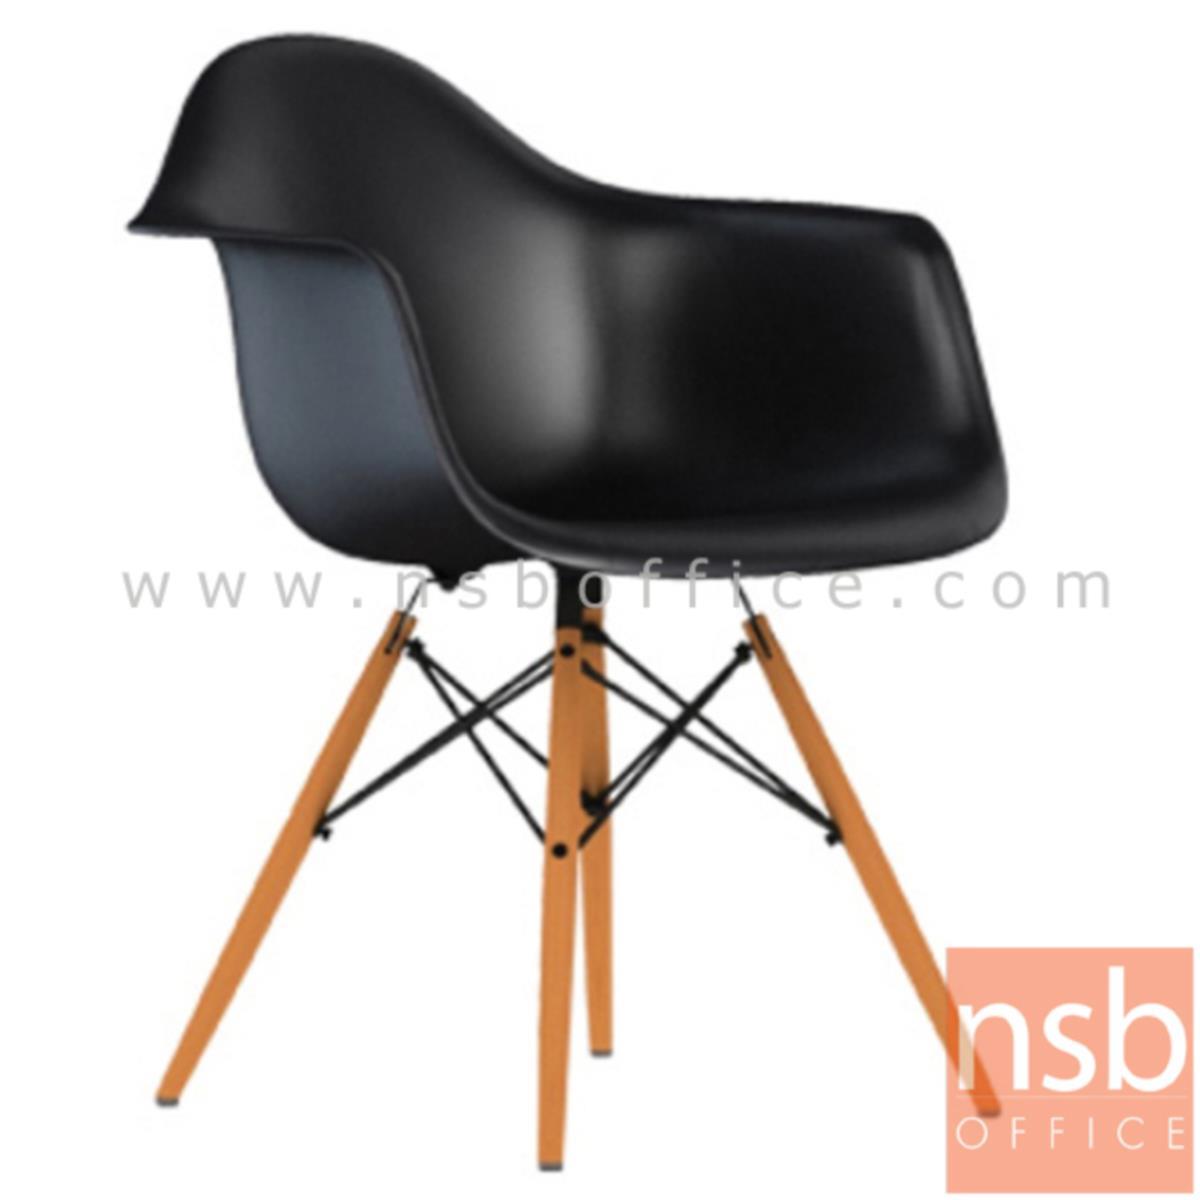 B05A089:เก้าอี้โมเดิร์นโพลี่ รุ่น Nazario (นาซารีโอ) ขนาด 62W cm. โครงเหล็กเส้นพ่นดำ ขาไม้สีบีช